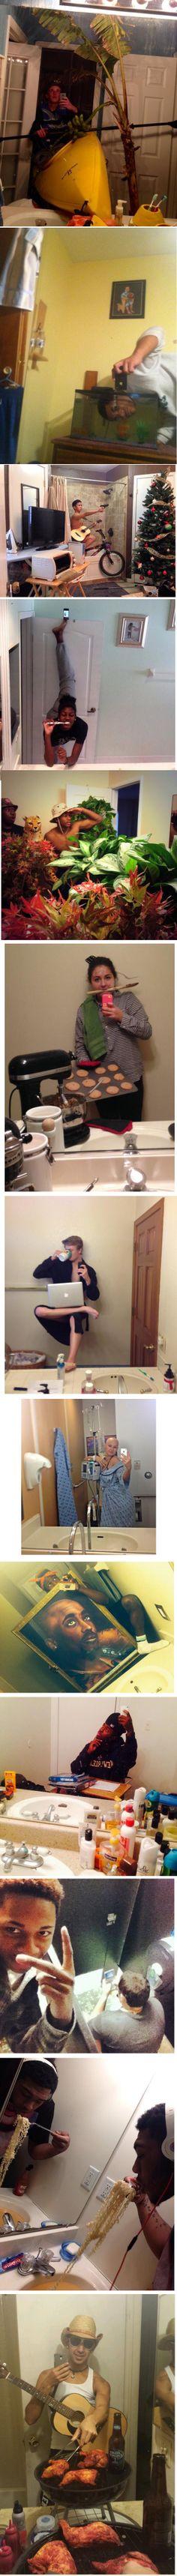 Selfielympics #funny #lol